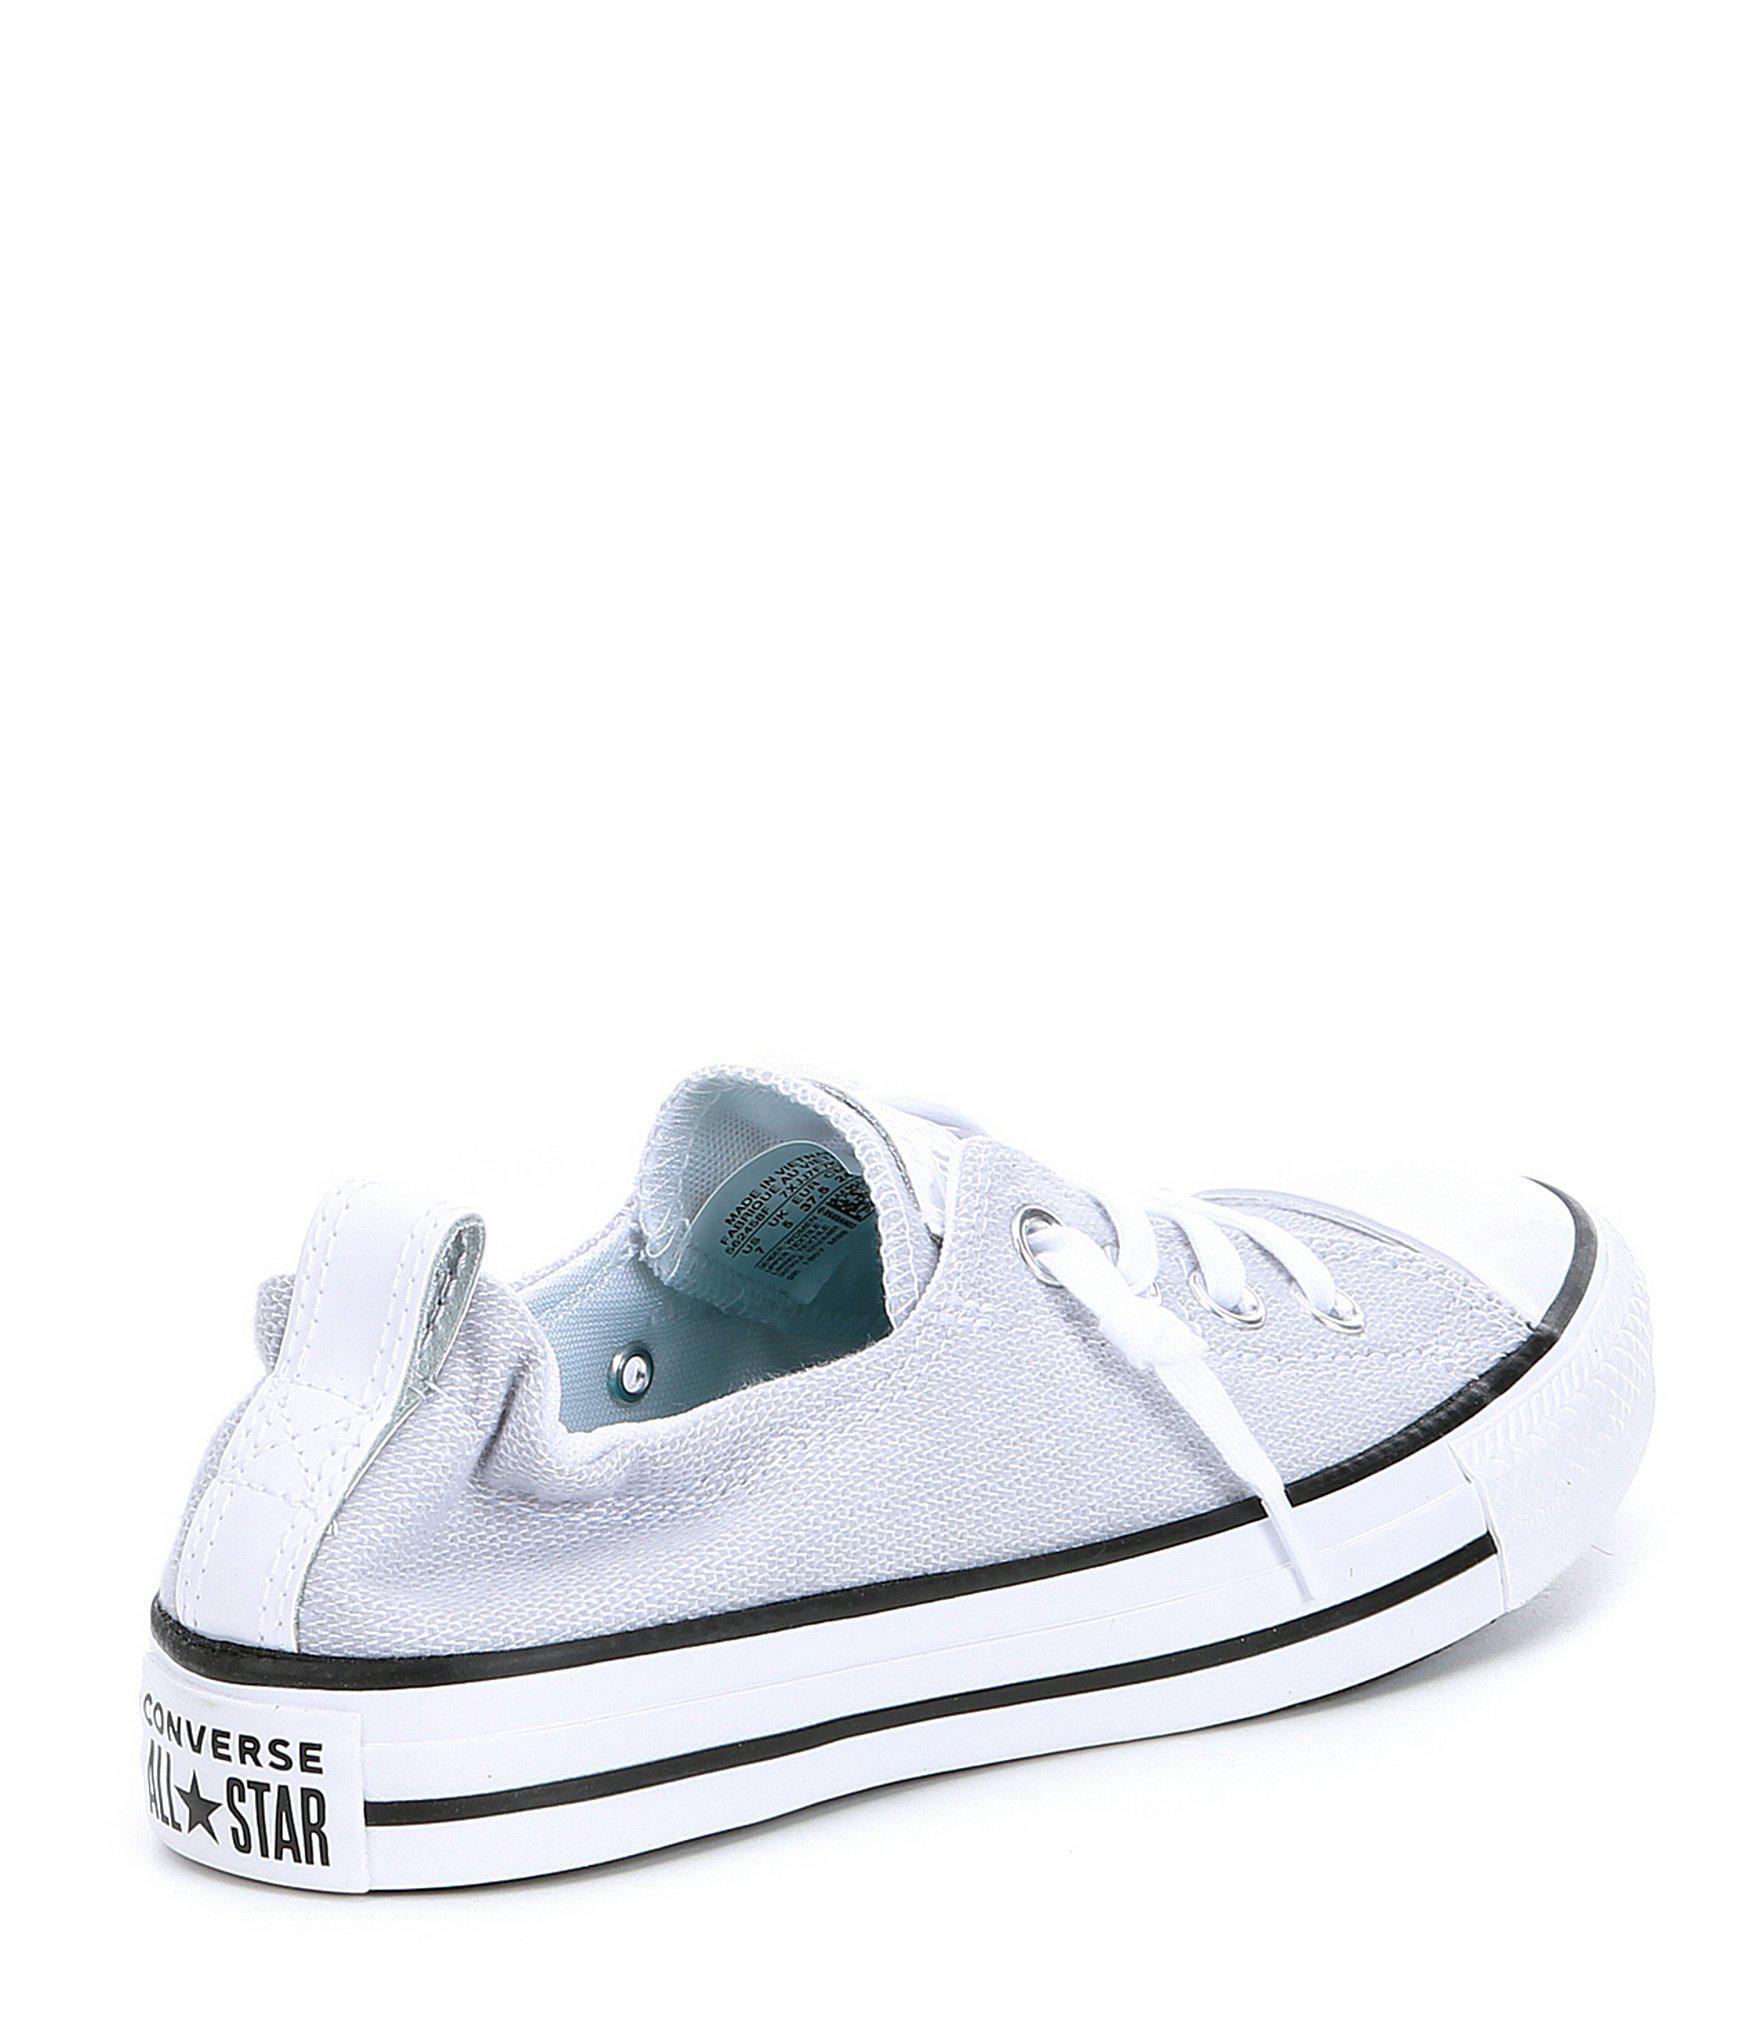 2fb30debc692c2 Converse - White Chuck Taylor All Star Shoreline Slip On Sneakers - Lyst.  View fullscreen